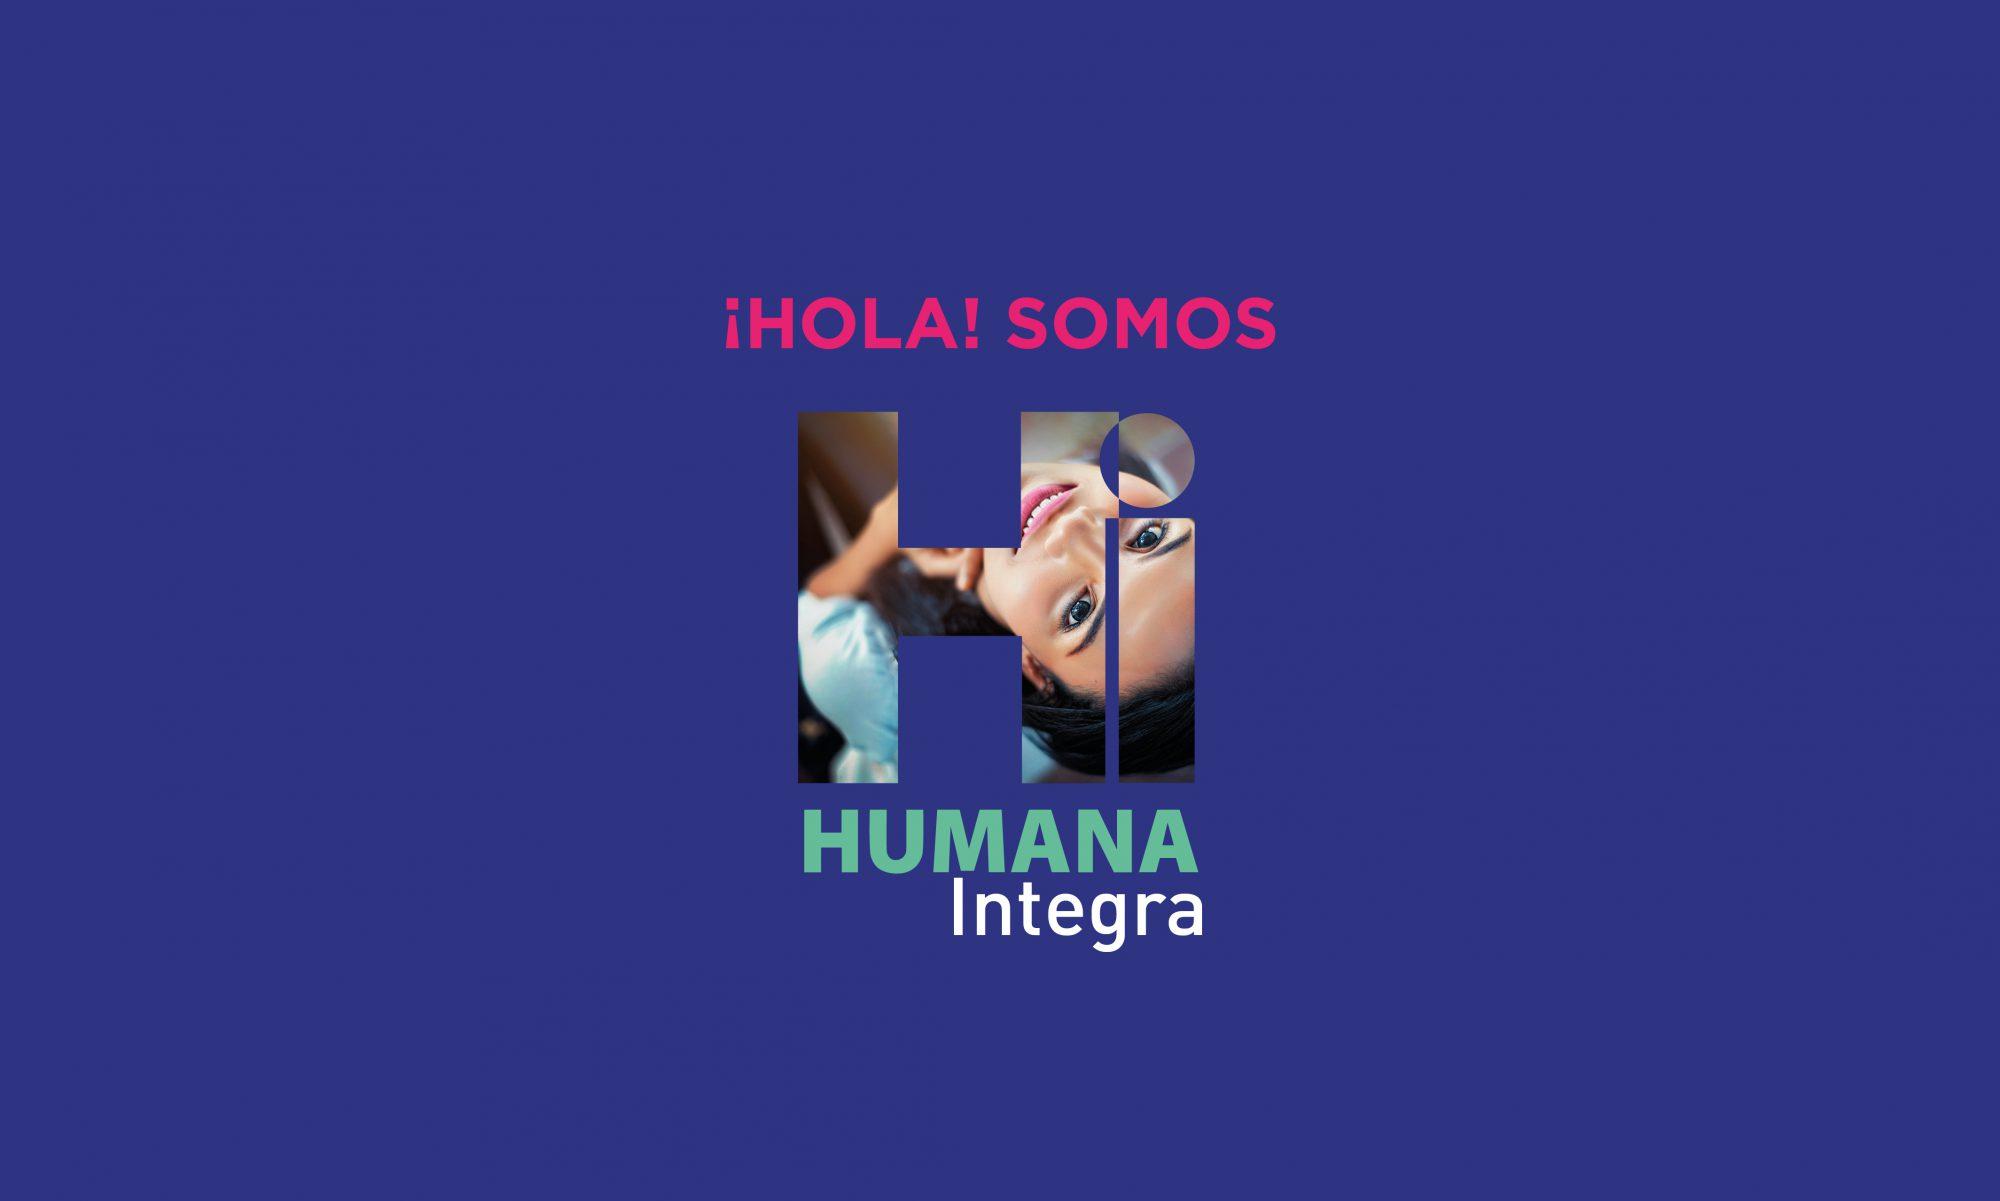 Humana Integra